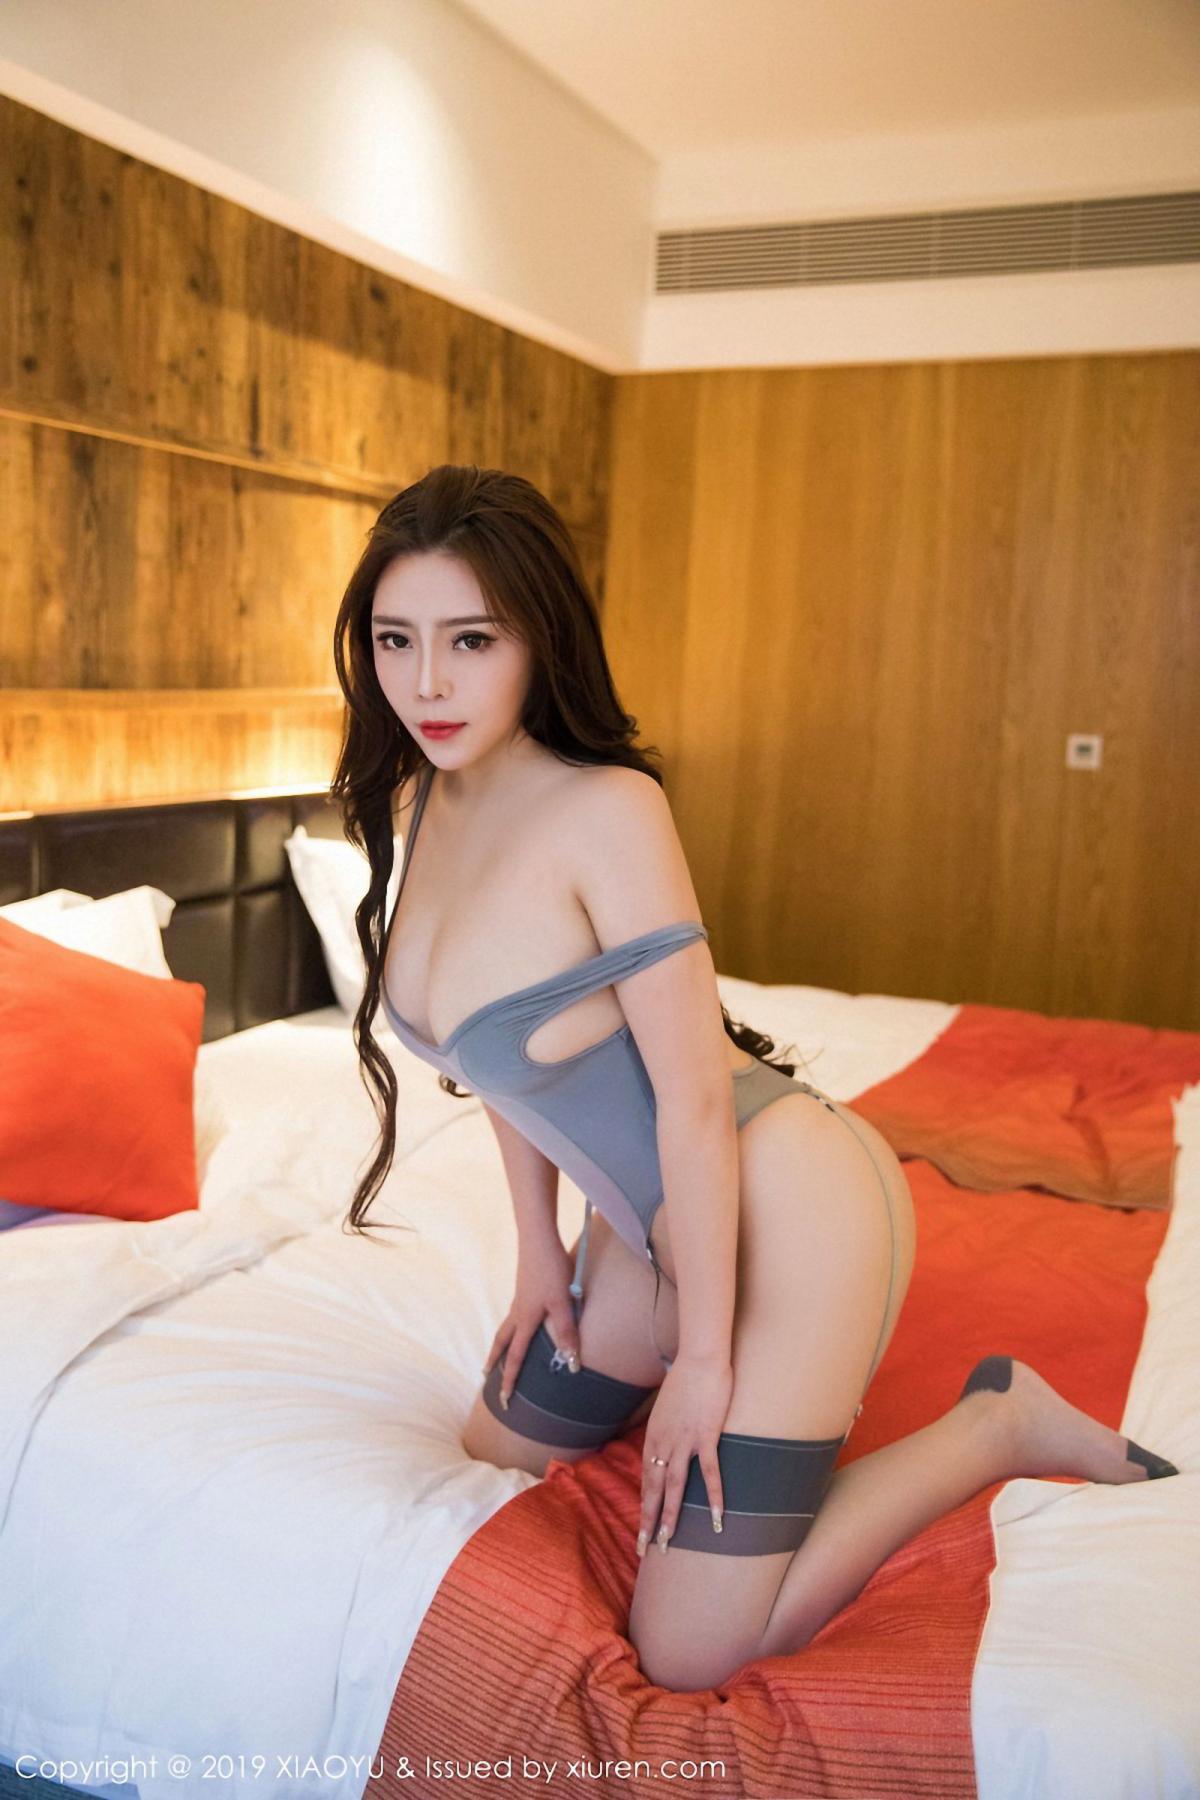 [XiaoYu] Vol.038 Miki Tu 41P, Miki Tu, XiaoYu